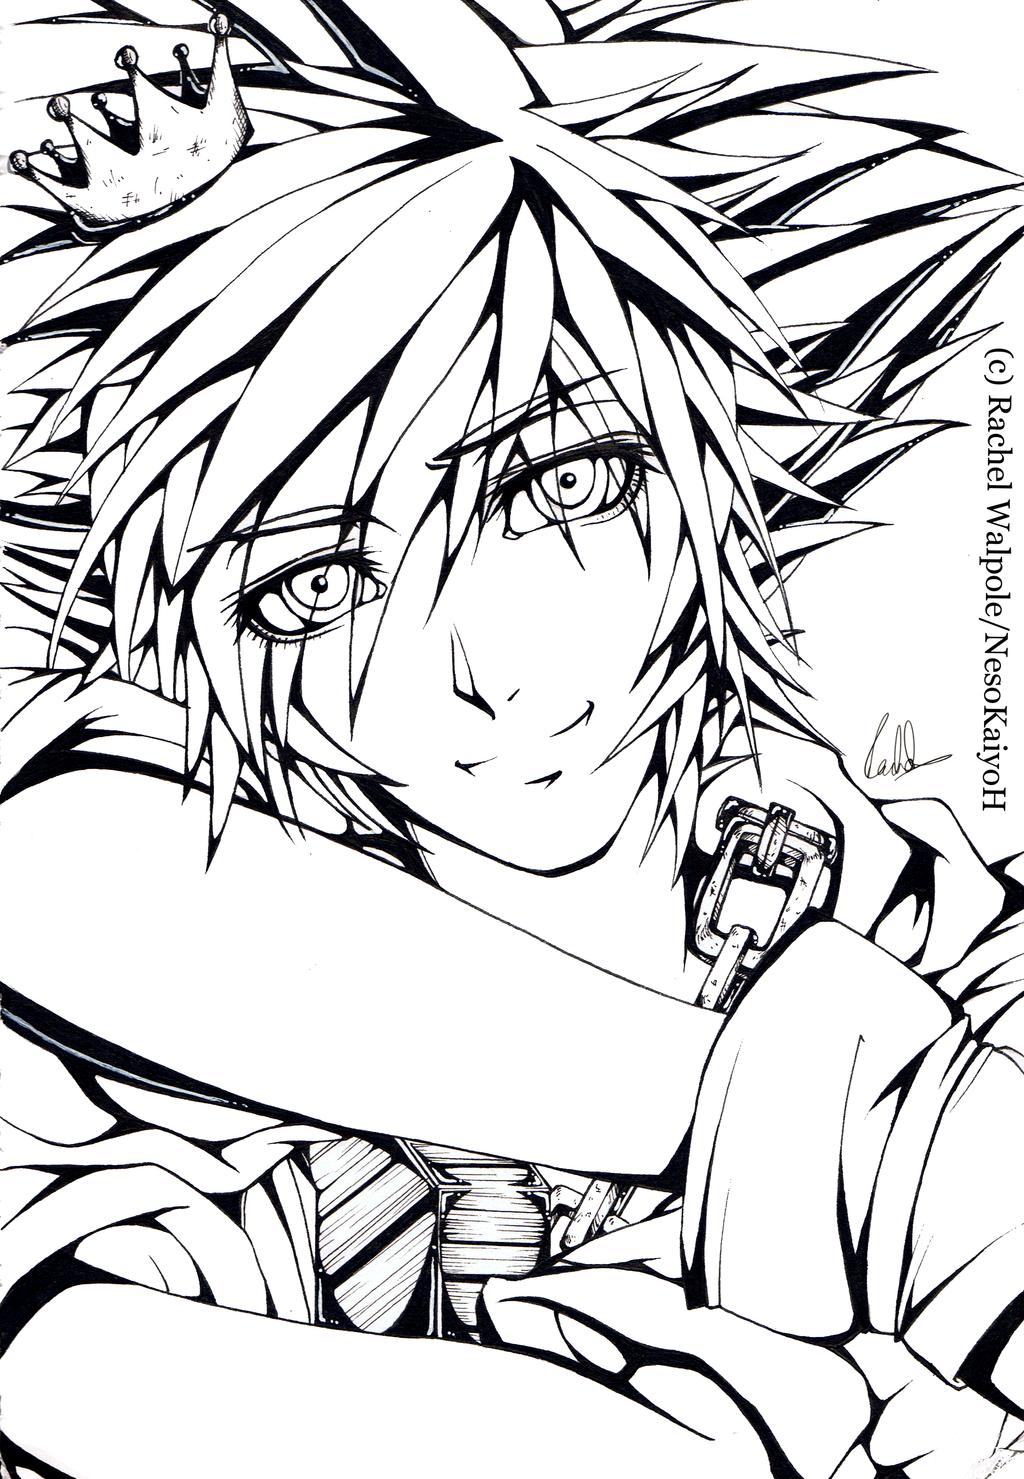 Kingdom Hearts Lineart : Kingdom hearts sora lineart by nesokaiyoh on deviantart